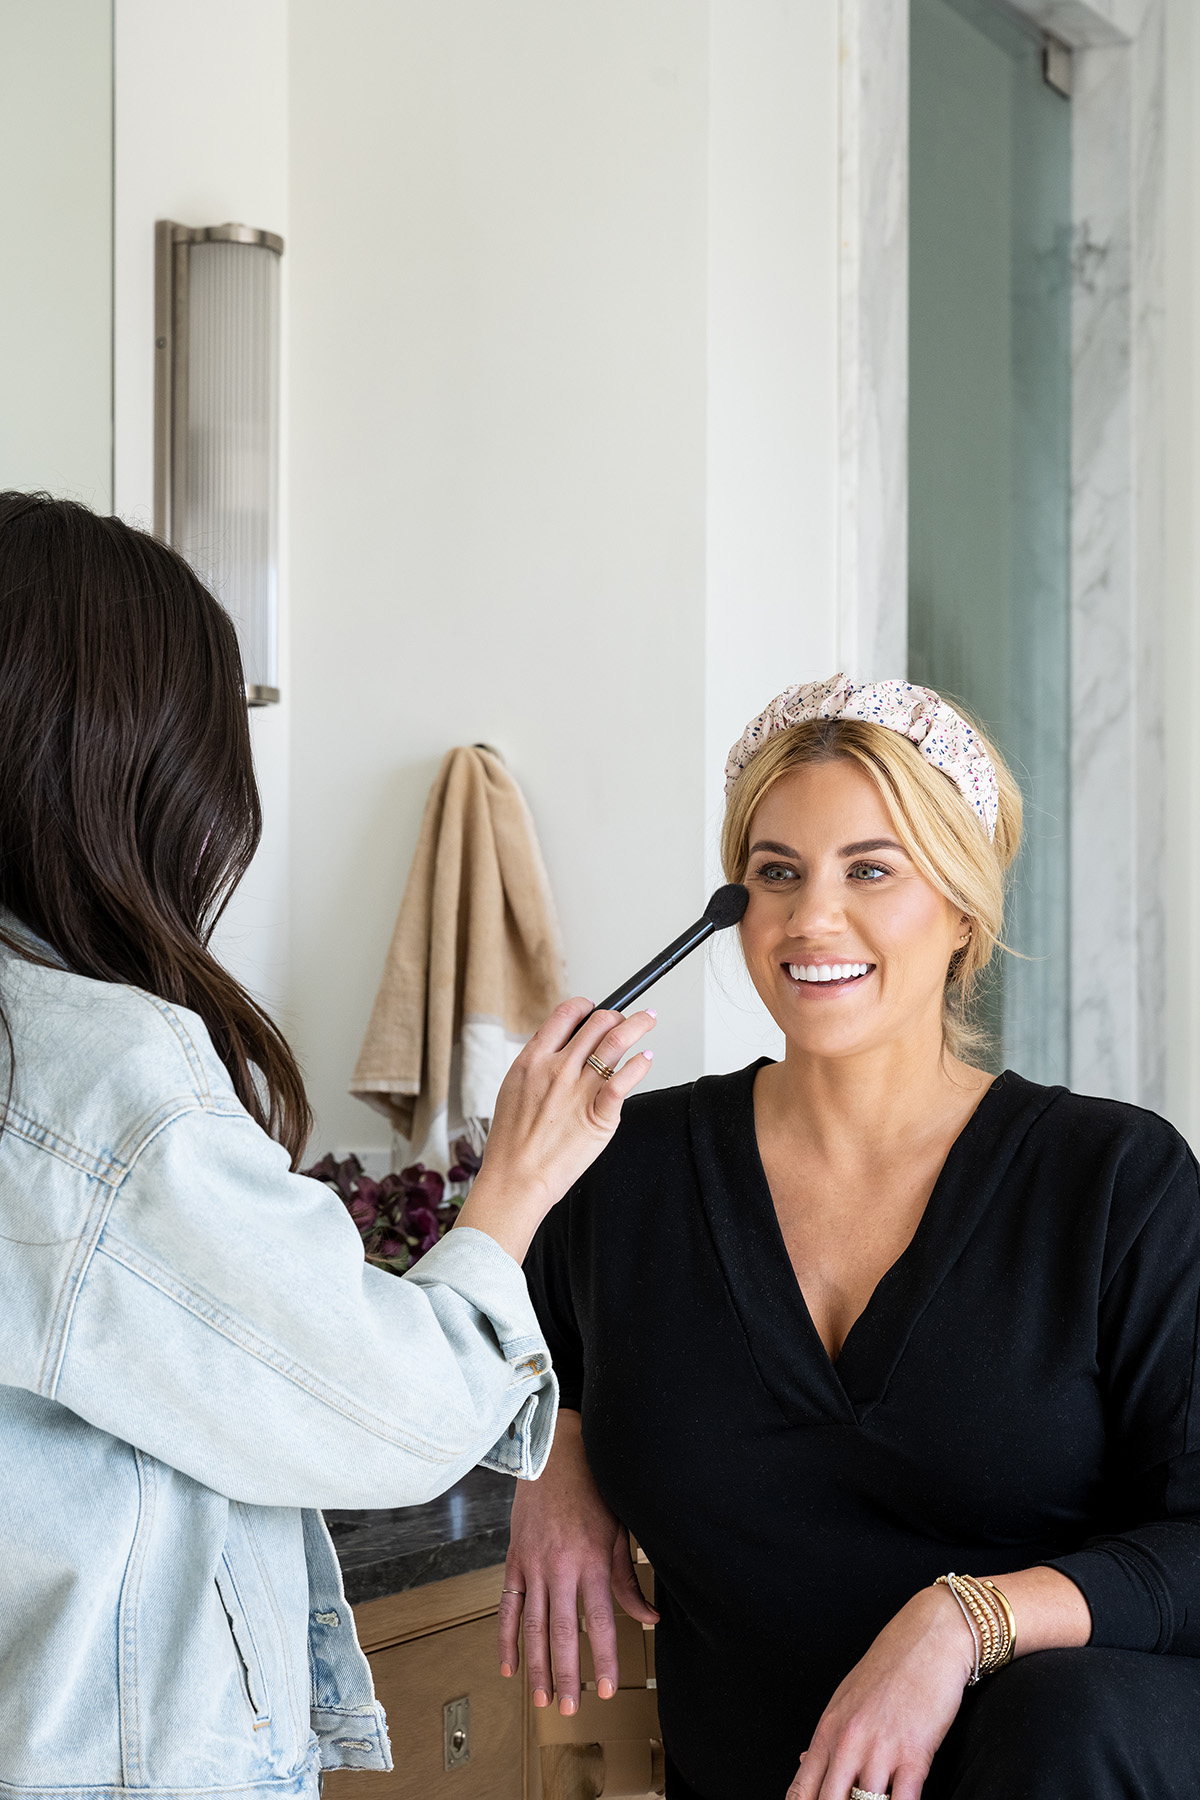 Shea's Makeup Routine